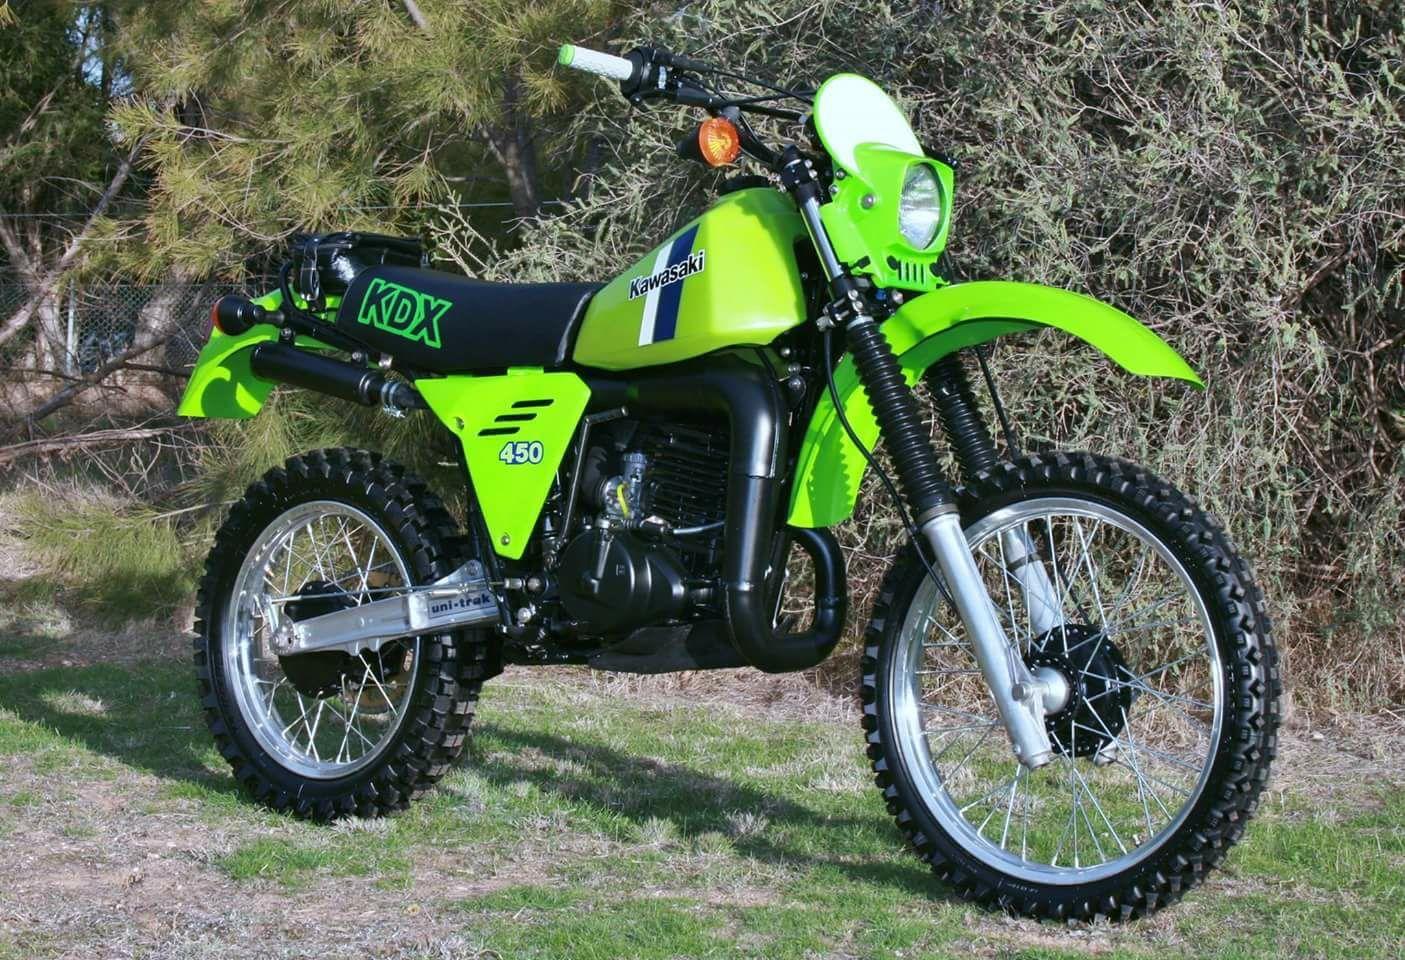 Kawasaki Kdx450 Enduro Motorcycle Vintage Motocross Vintage Bikes